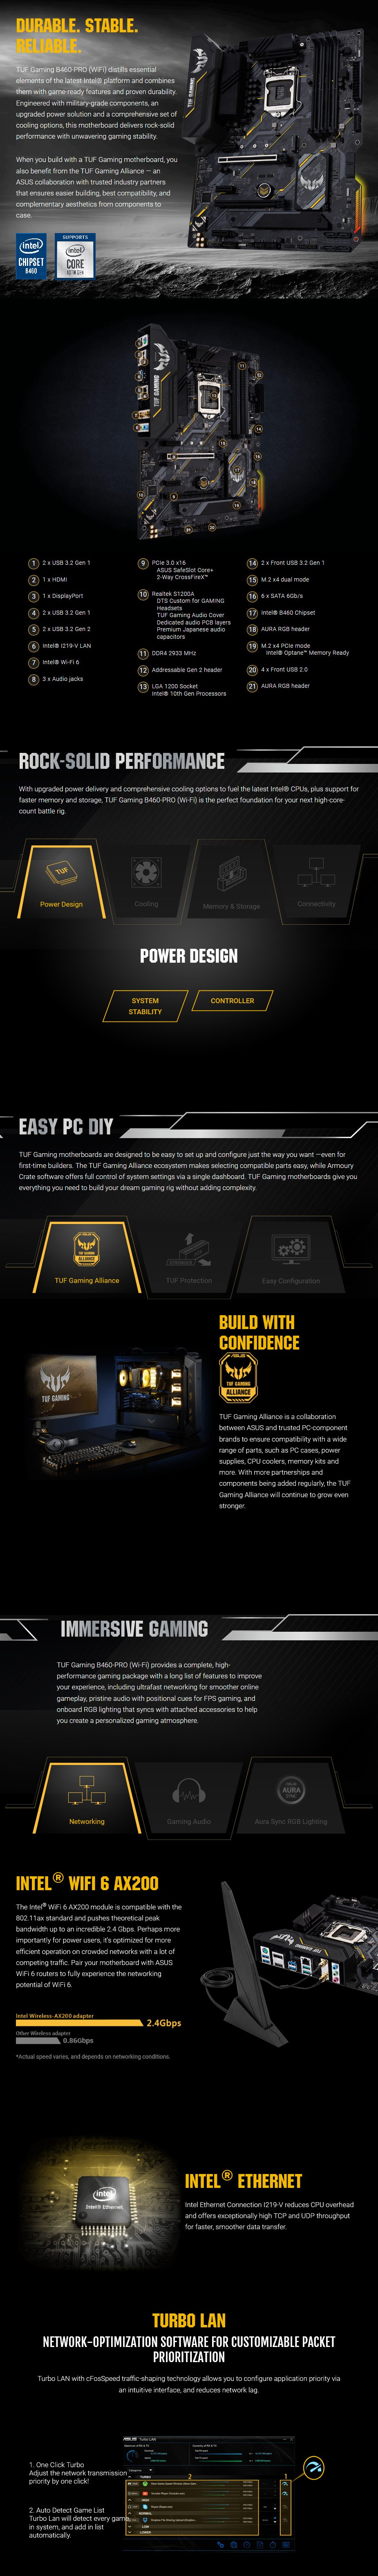 ASUS TUF GAMING B460-PRO (WI-FI) LGA 1200 ATX Motherboard - Overview 1